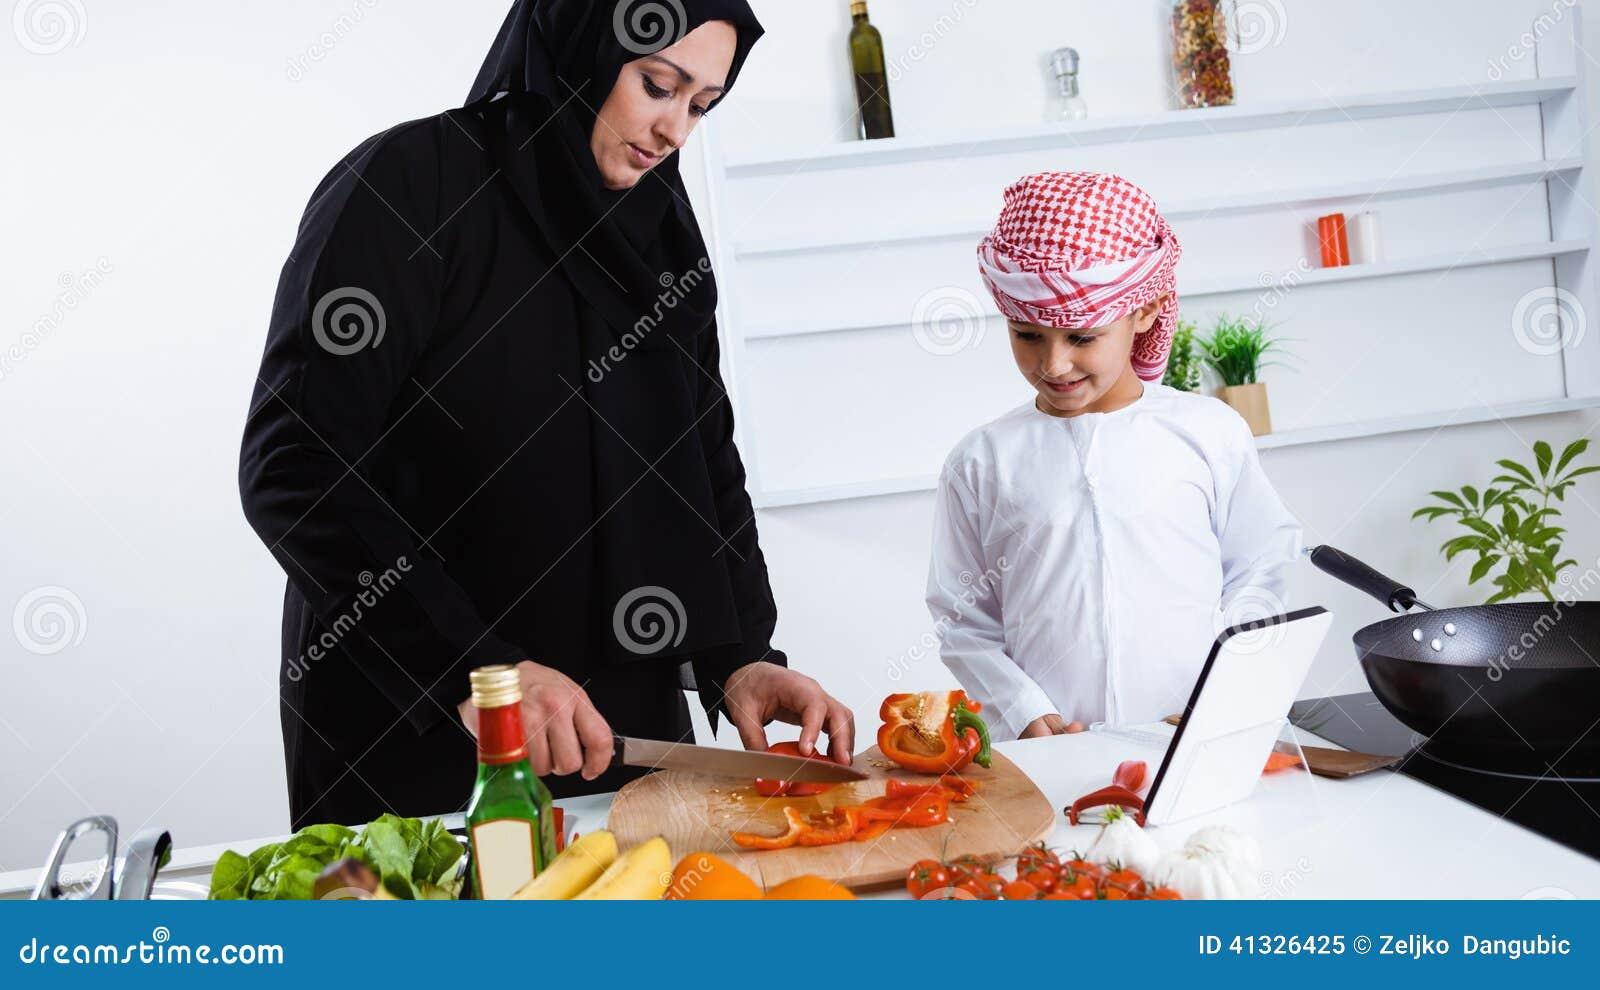 Арабская женщина на кухне видео фото 569-545